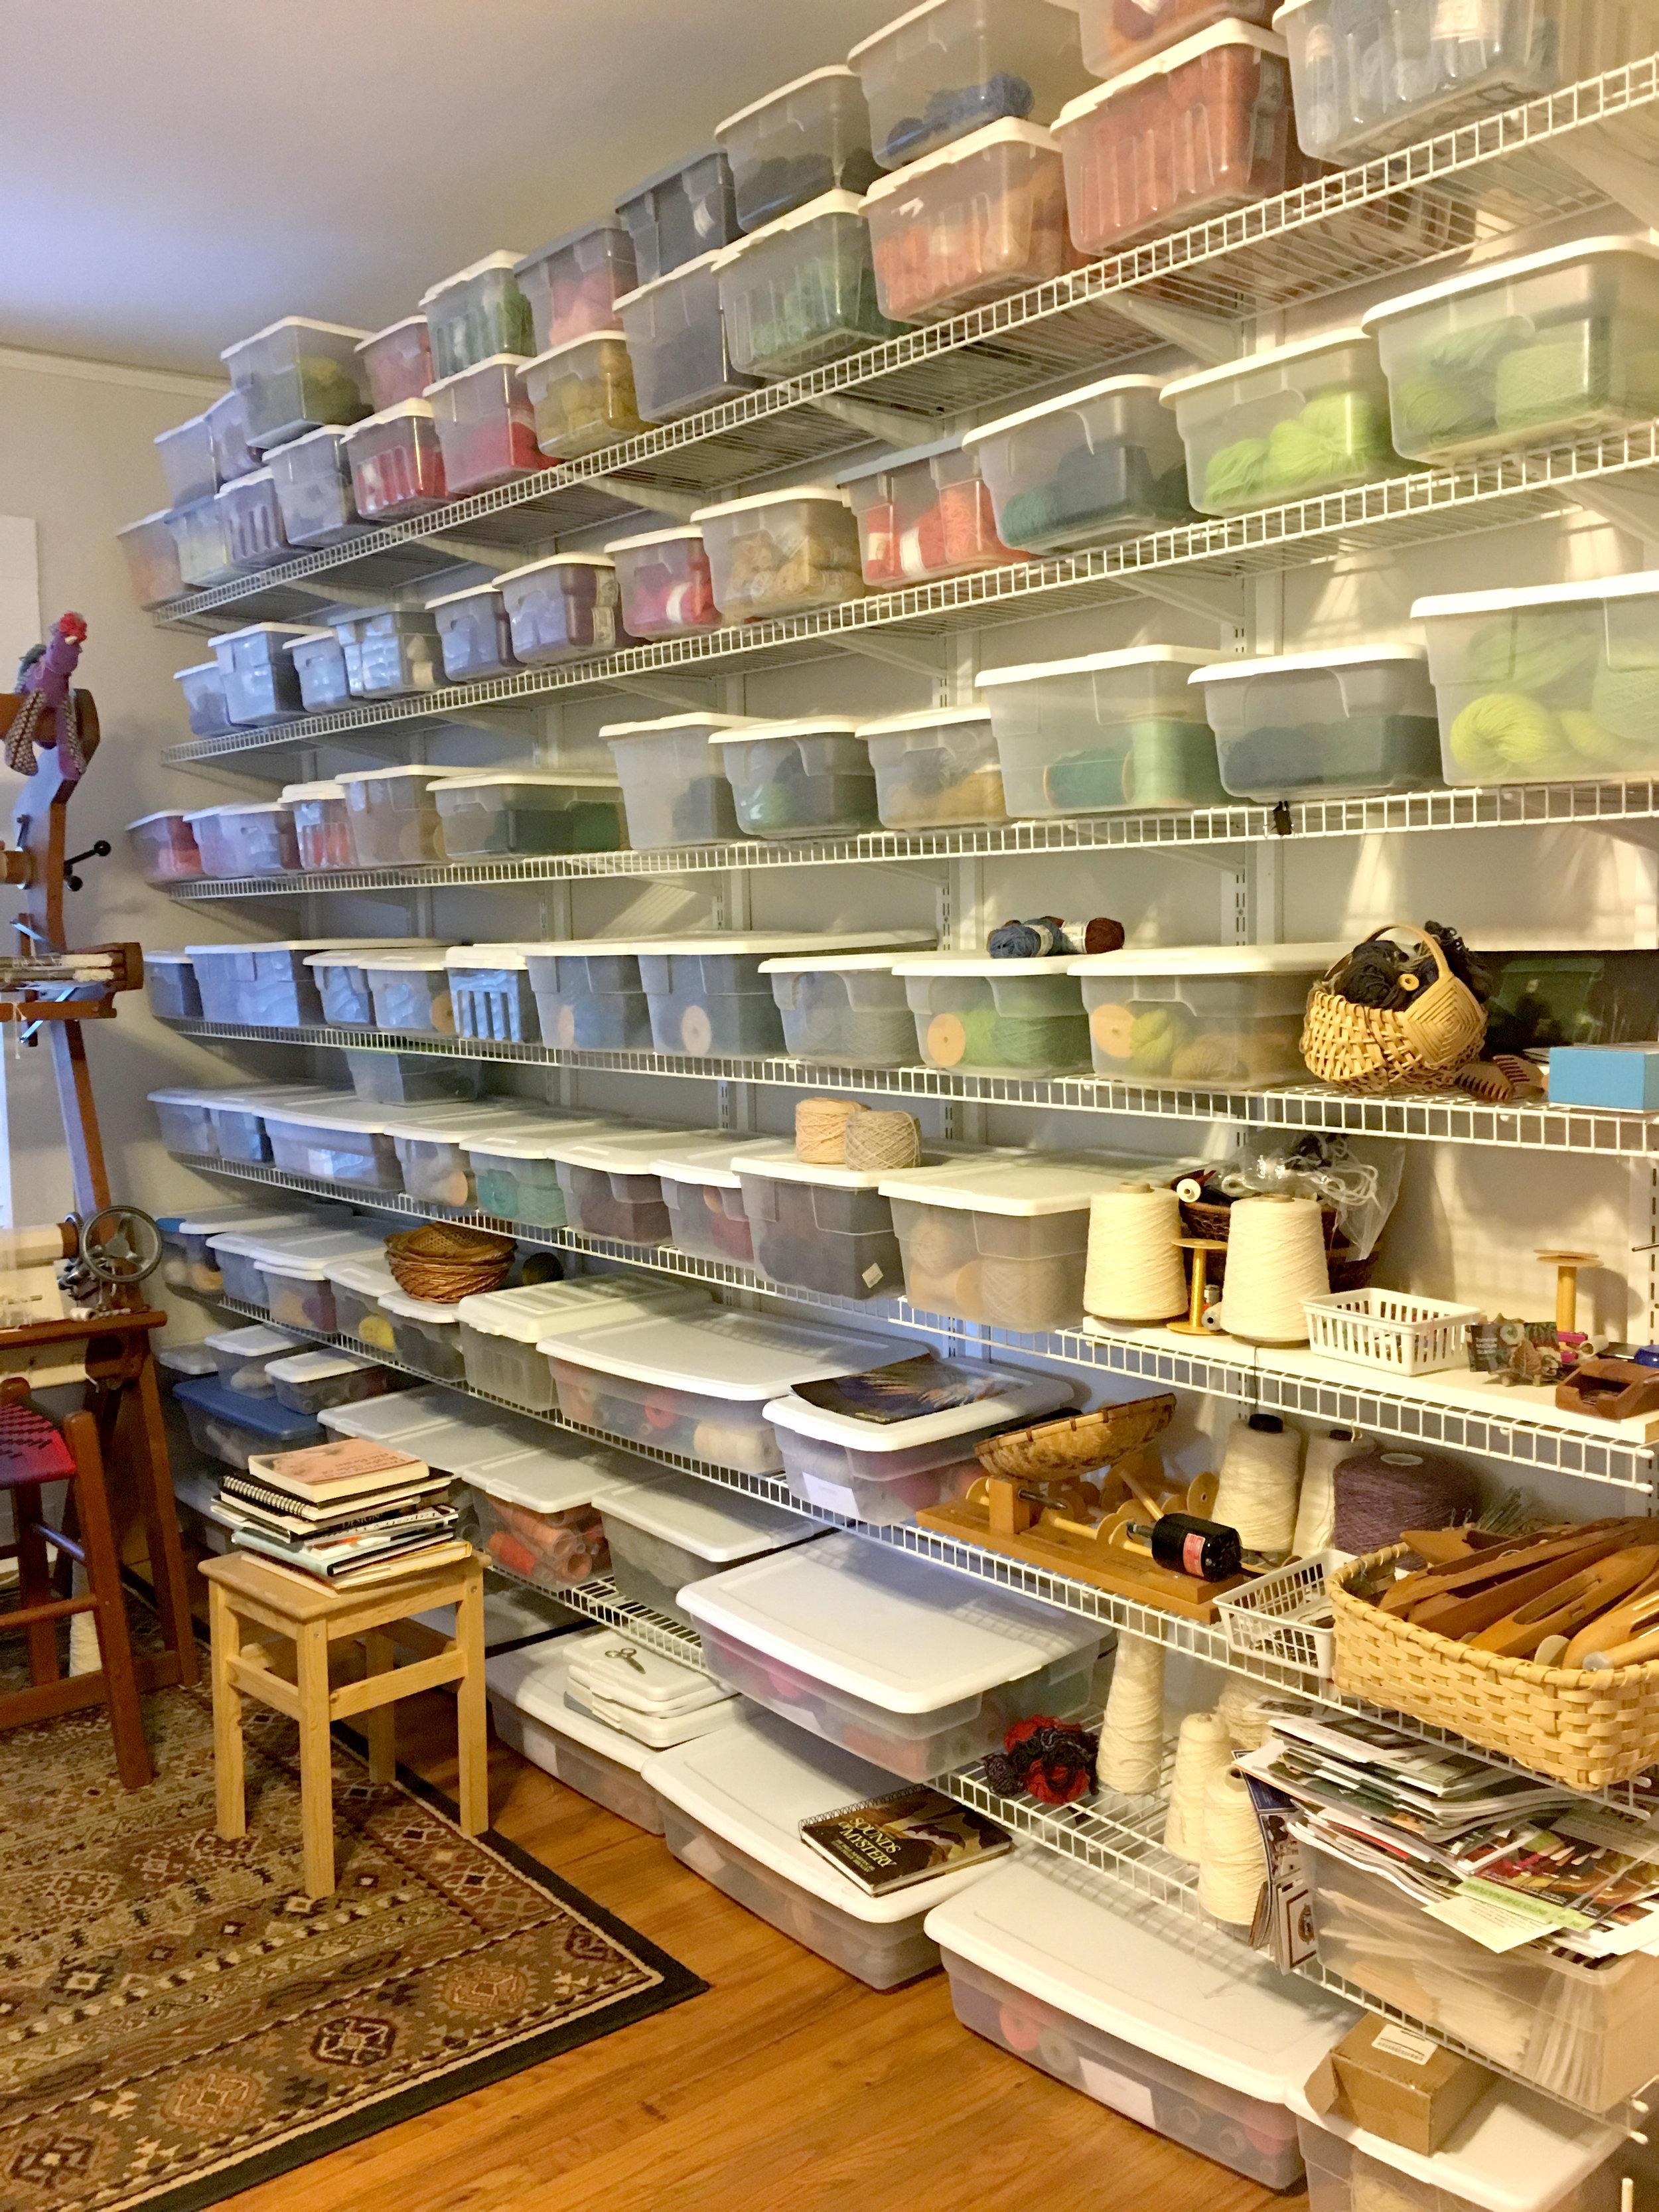 Organizational goals: Tommye Scanlin's Studio